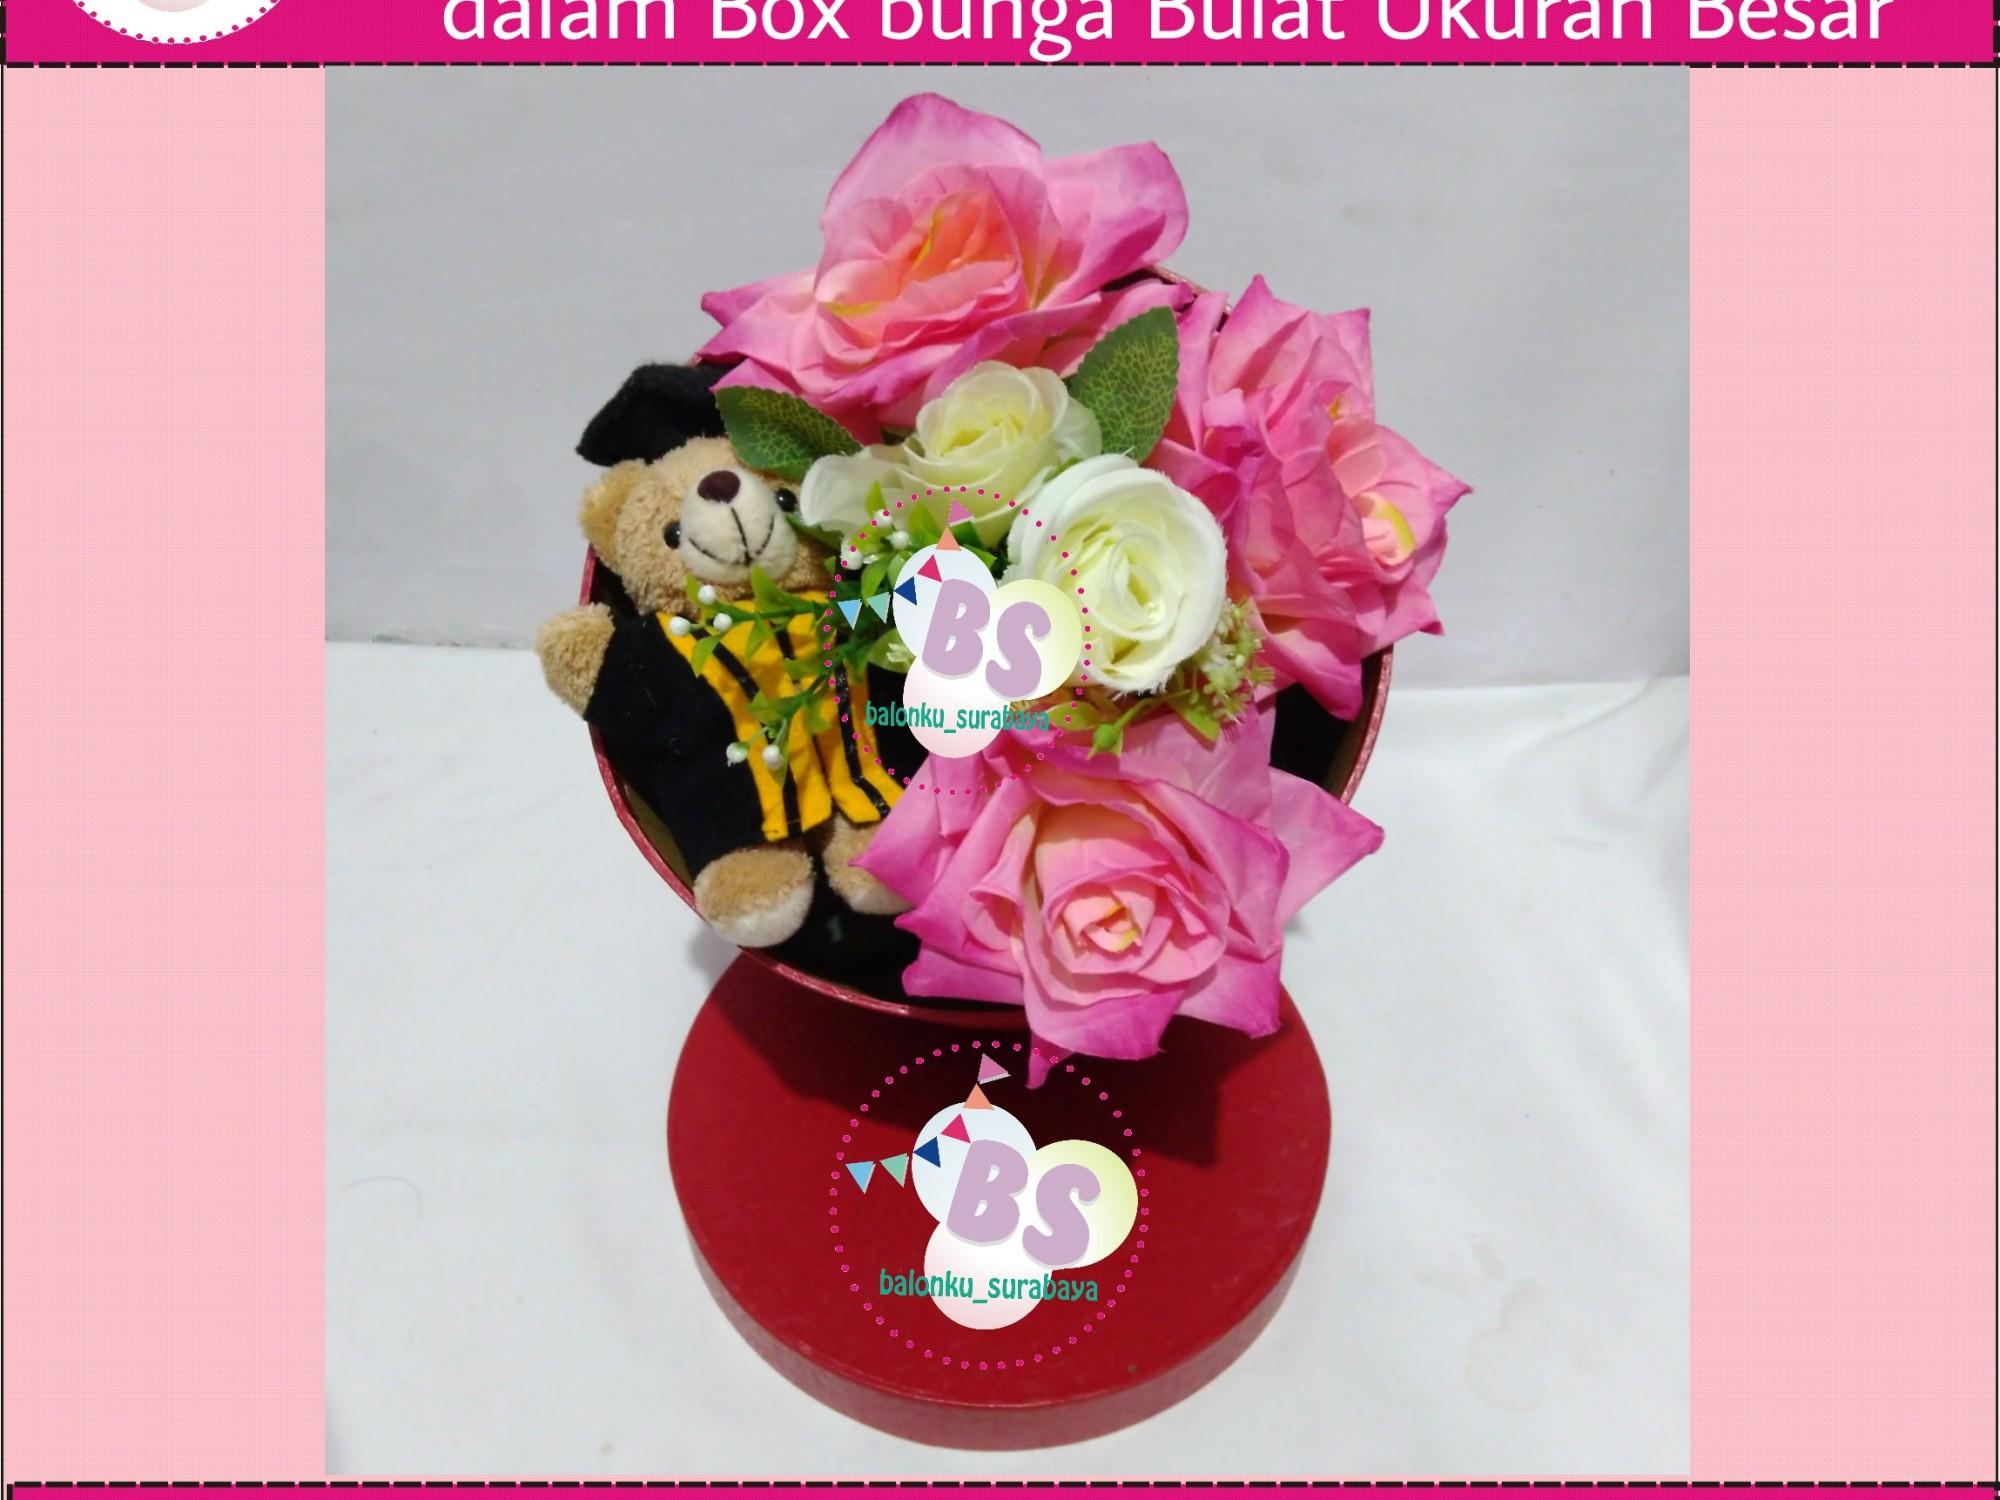 Bunga dekorasi, Rangkaian bunga artificial, Buket bunga, buket bunga mawar, harga buket bunga,Balon sablon, balon Printing, balon promosi, , Perlengkapan ulang tahun, Balon latex , balon doff, balon latex merah, balon doff merah, balon natal, balon agustusan, balon dekorasi, balonku Surabaya, 085733133529